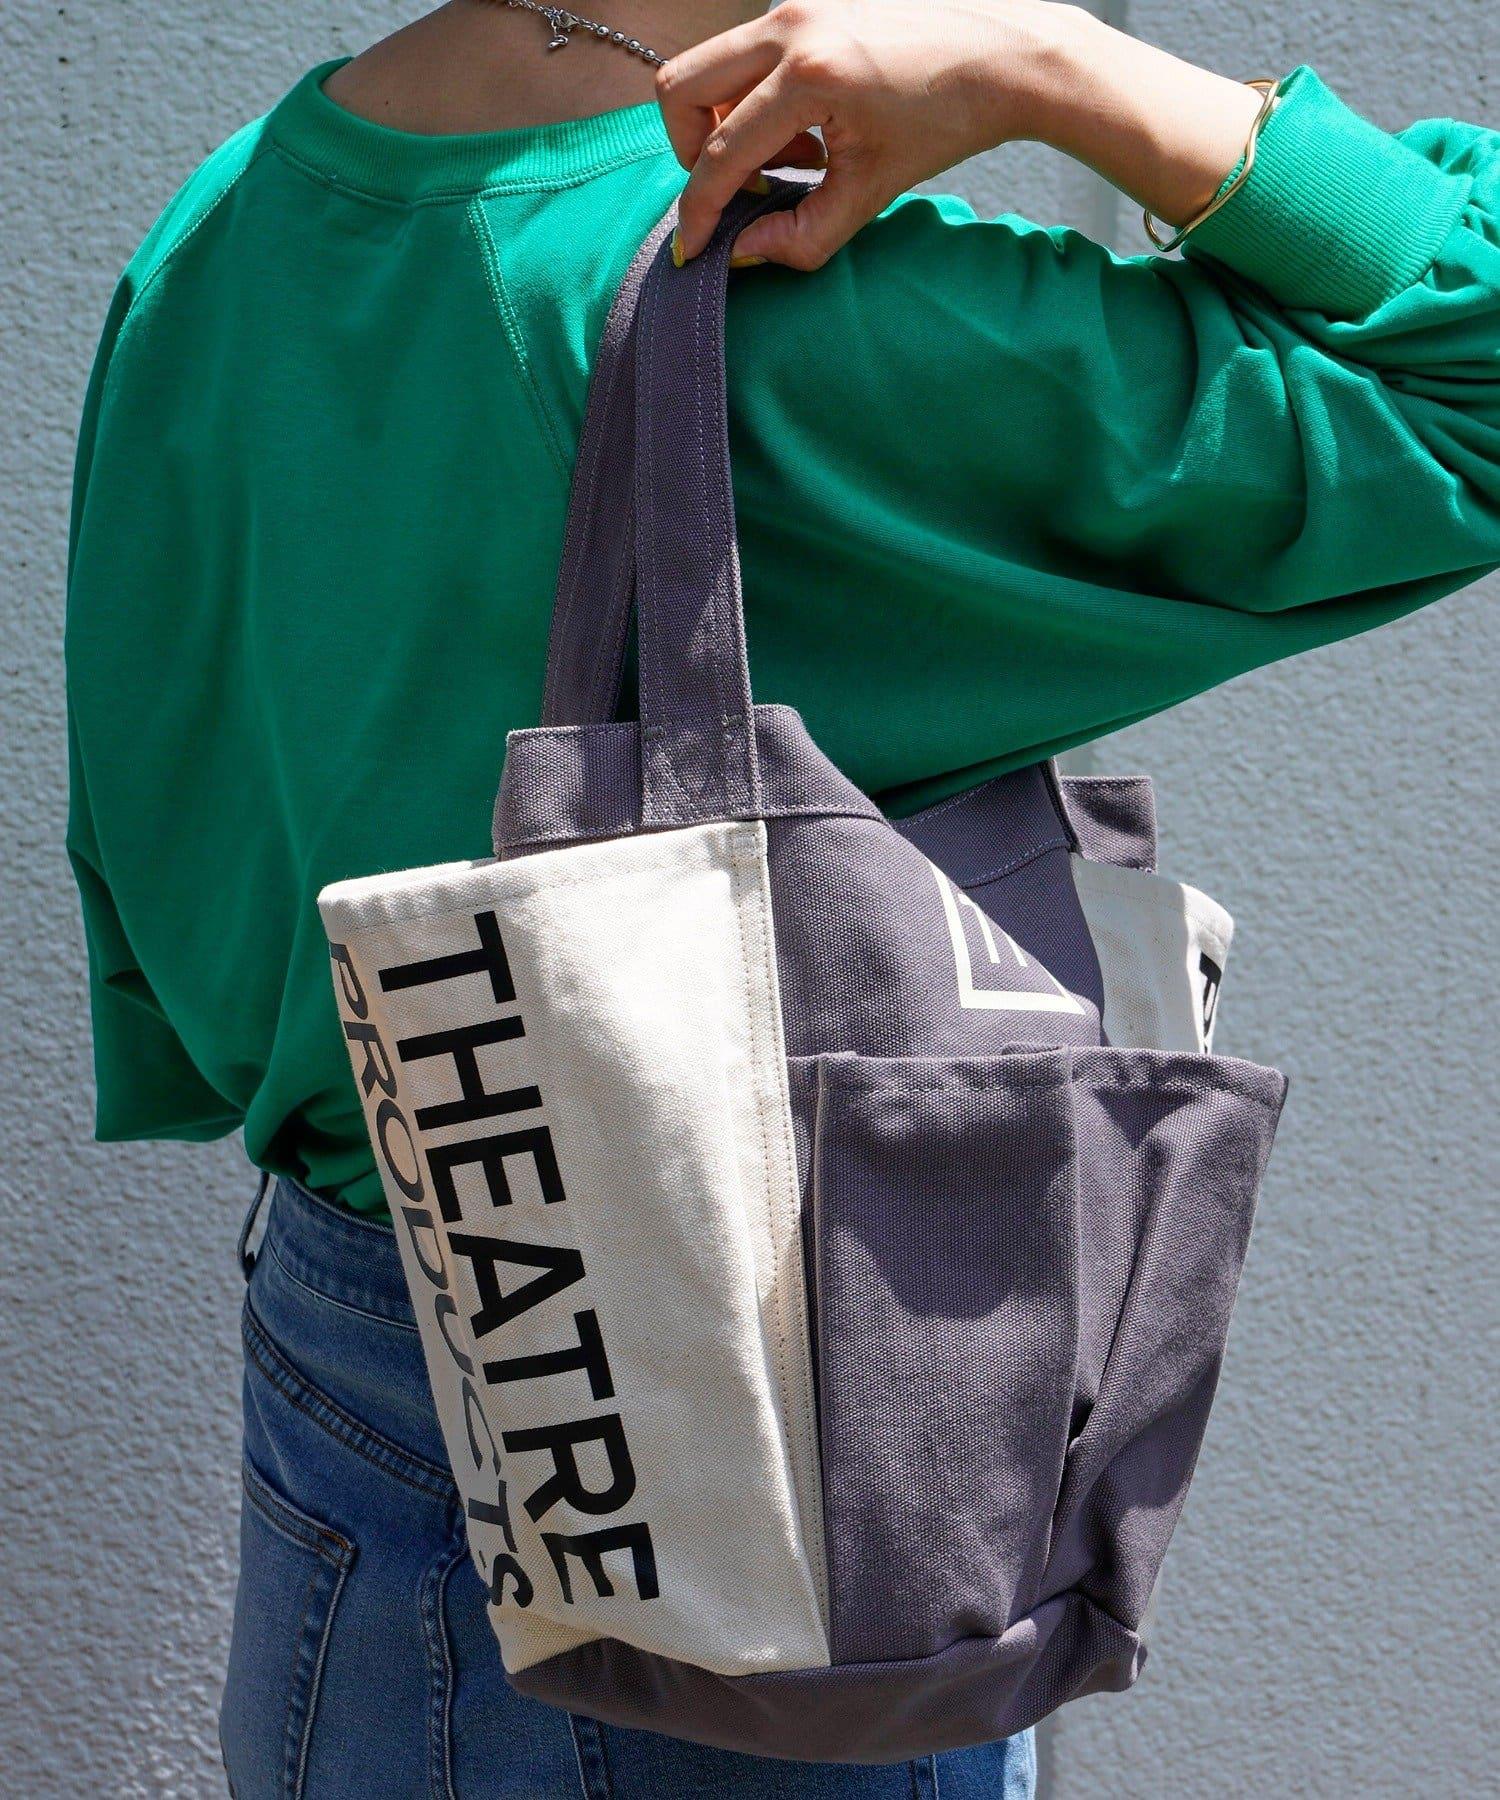 CIAOPANIC TYPY(チャオパニックティピー) 【WEB限定】【THEATRE PRODUCTS】別注ガーデンバッグS